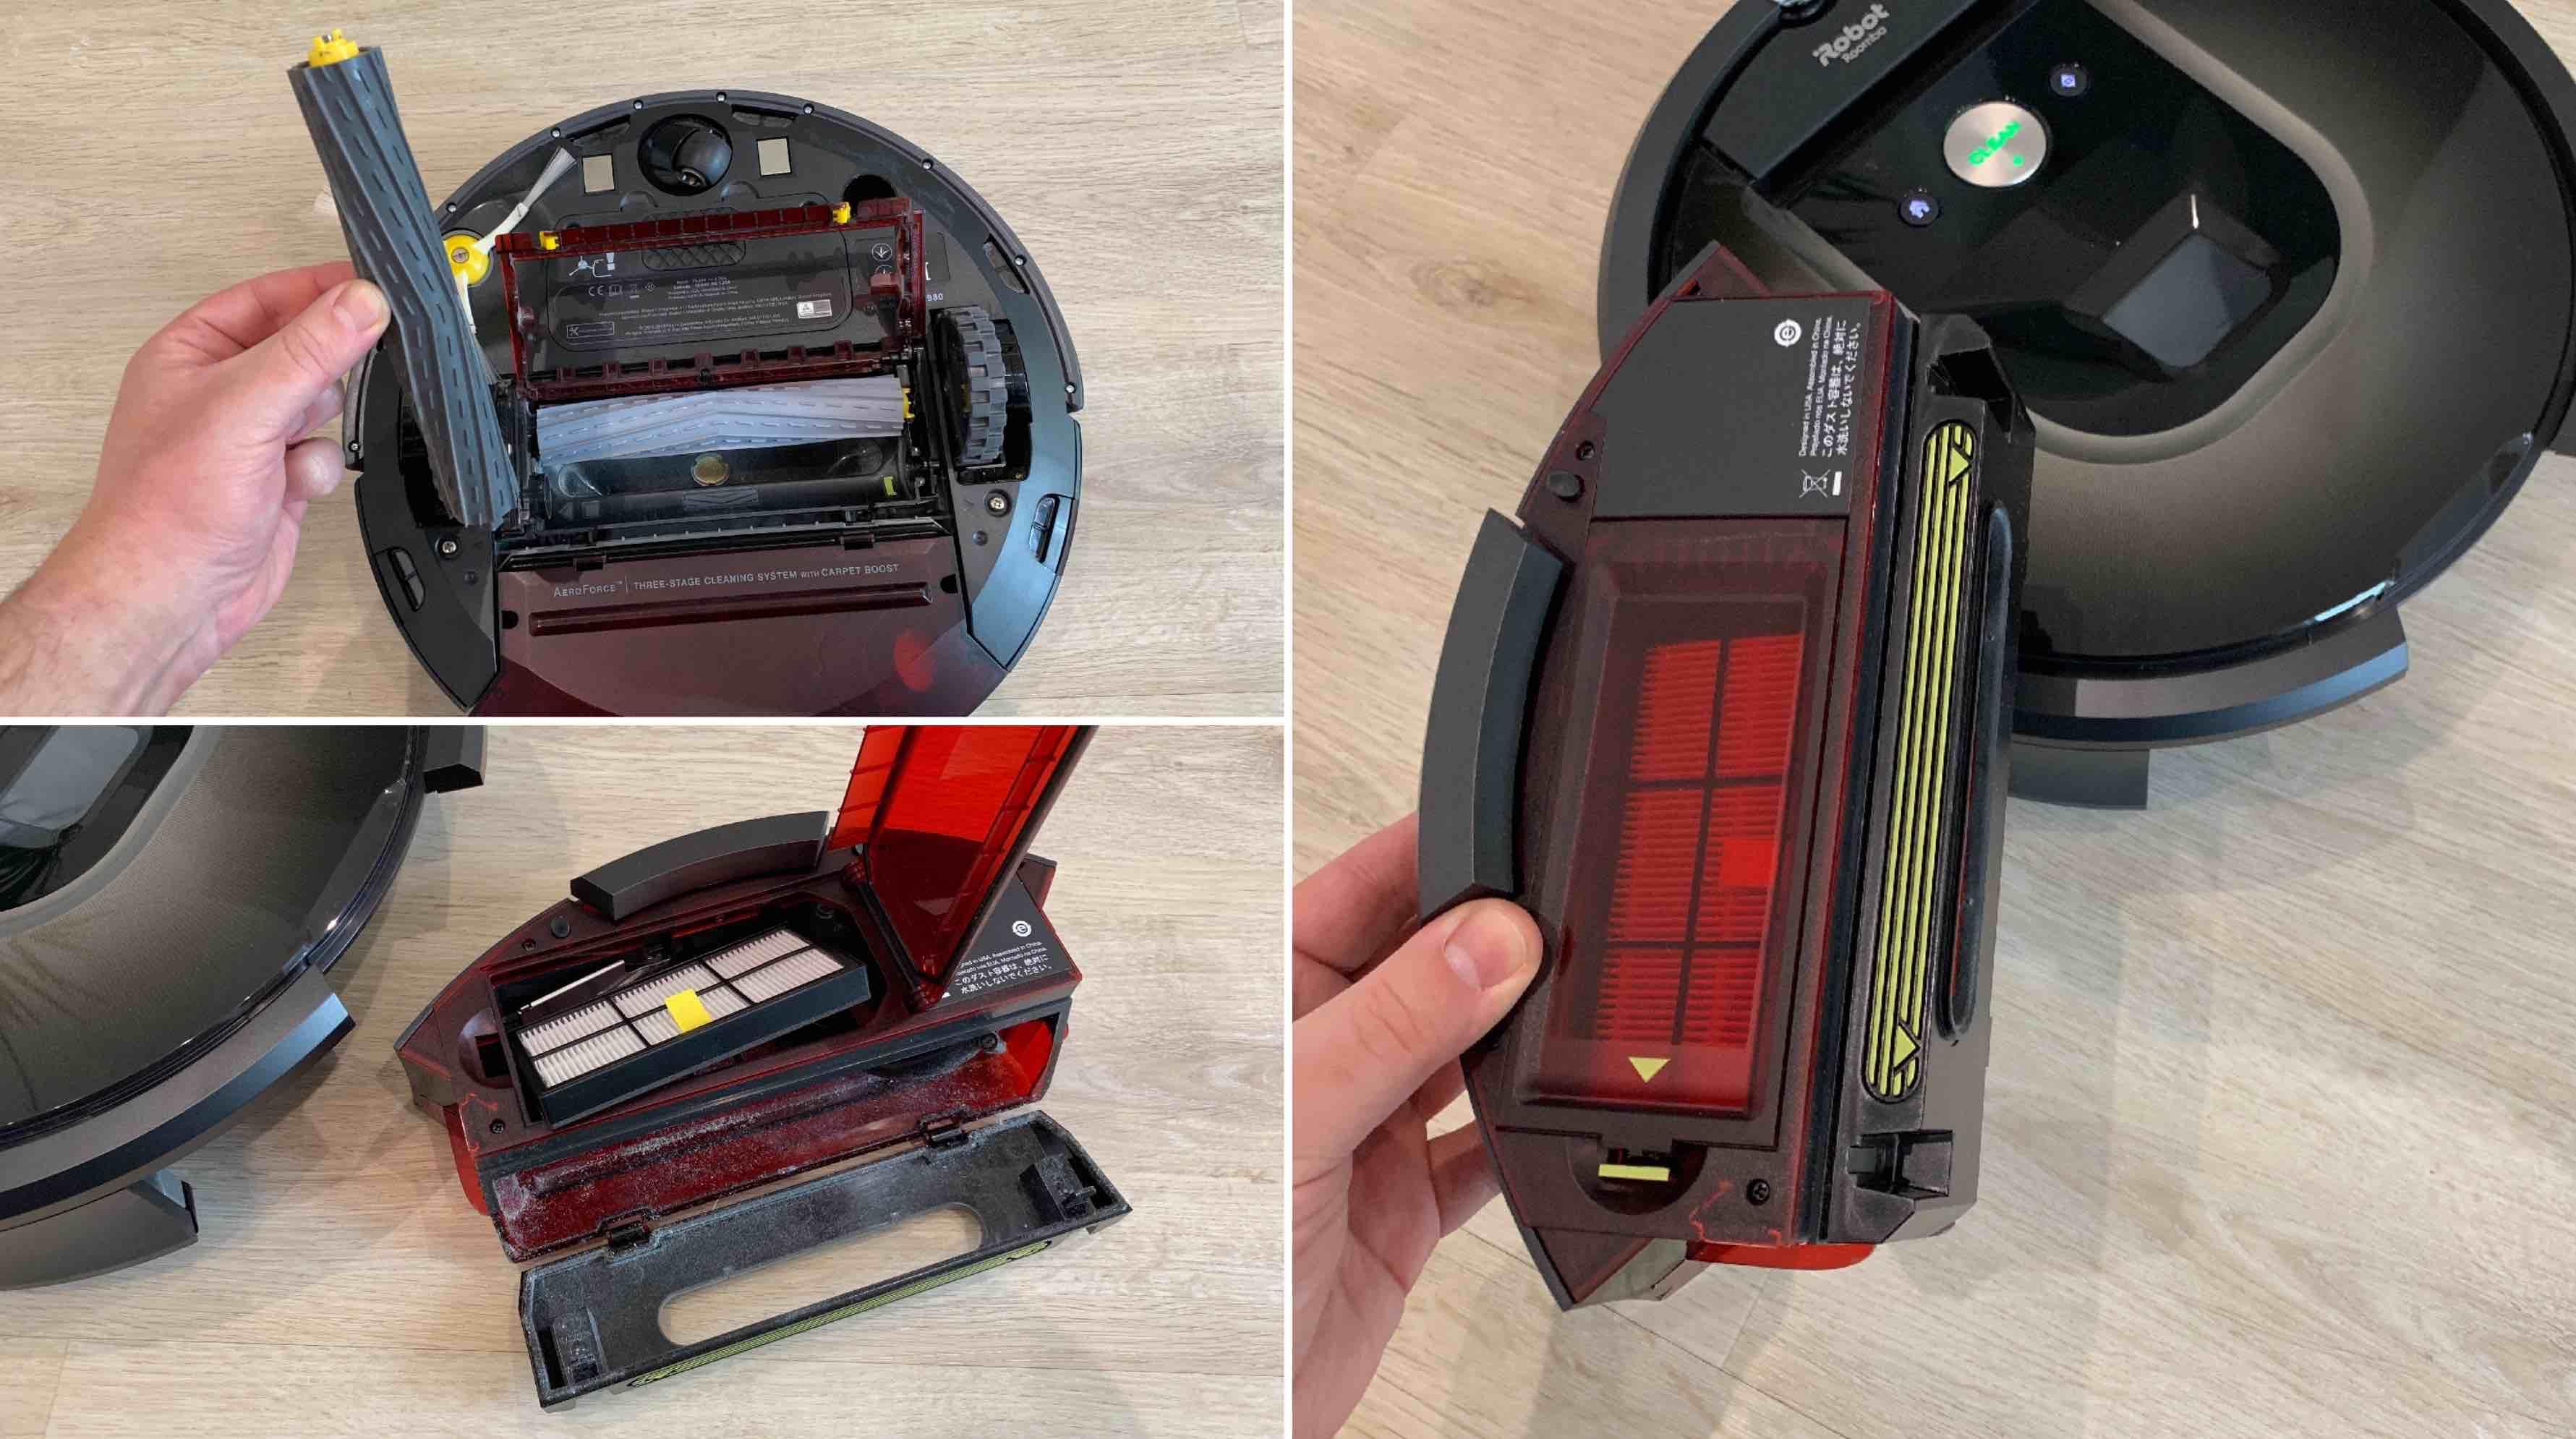 iRobot_Roomba_980_Roboter_SmartHome_Review1 iRobot Roomba 980 - intelligent, zuverlässig und akkurat das Heim saugen lassen